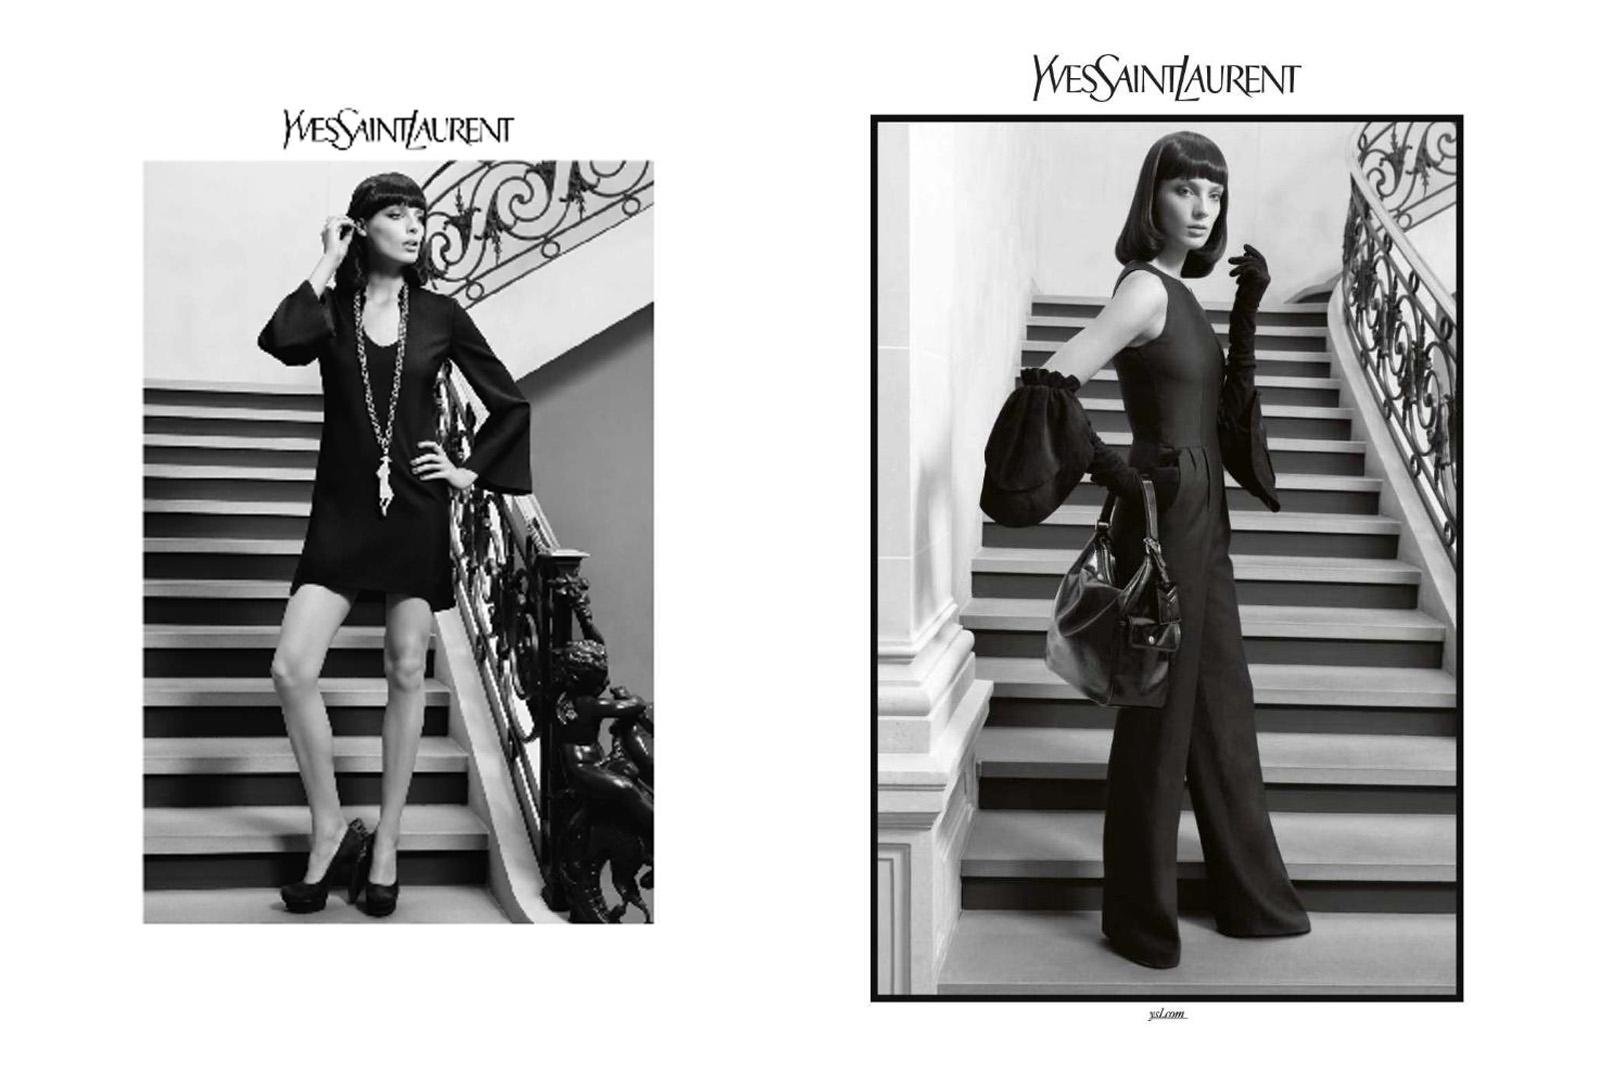 http://3.bp.blogspot.com/_Odu7eqW6gAY/TFSH8_Wt03I/AAAAAAAAhoM/djp6DcDWc3g/s1600/Daria+Werbowy+for+Yves+Saint+Laurent+02.jpg